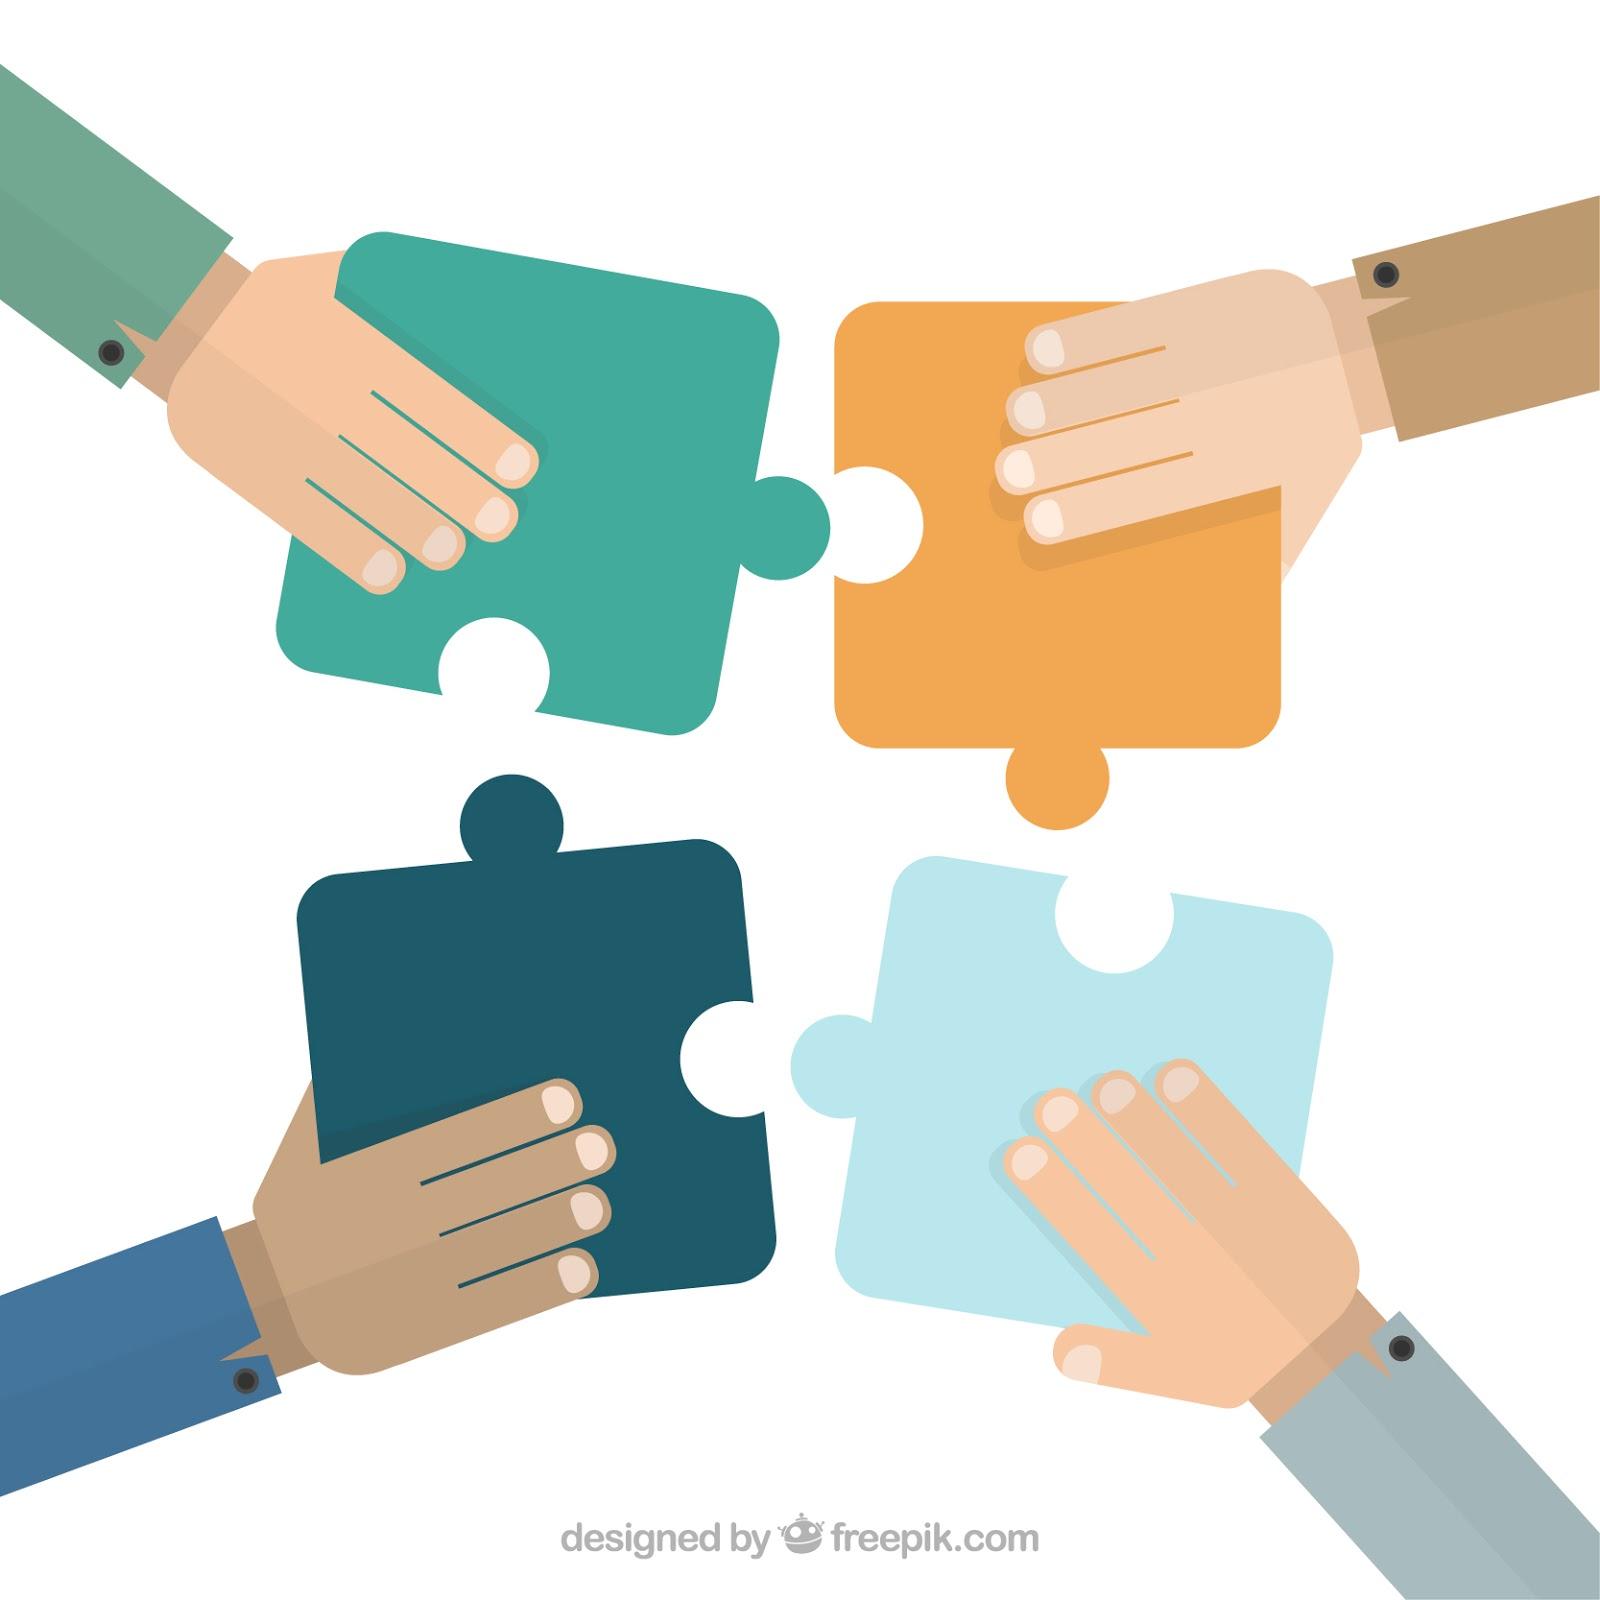 role of public developement in building